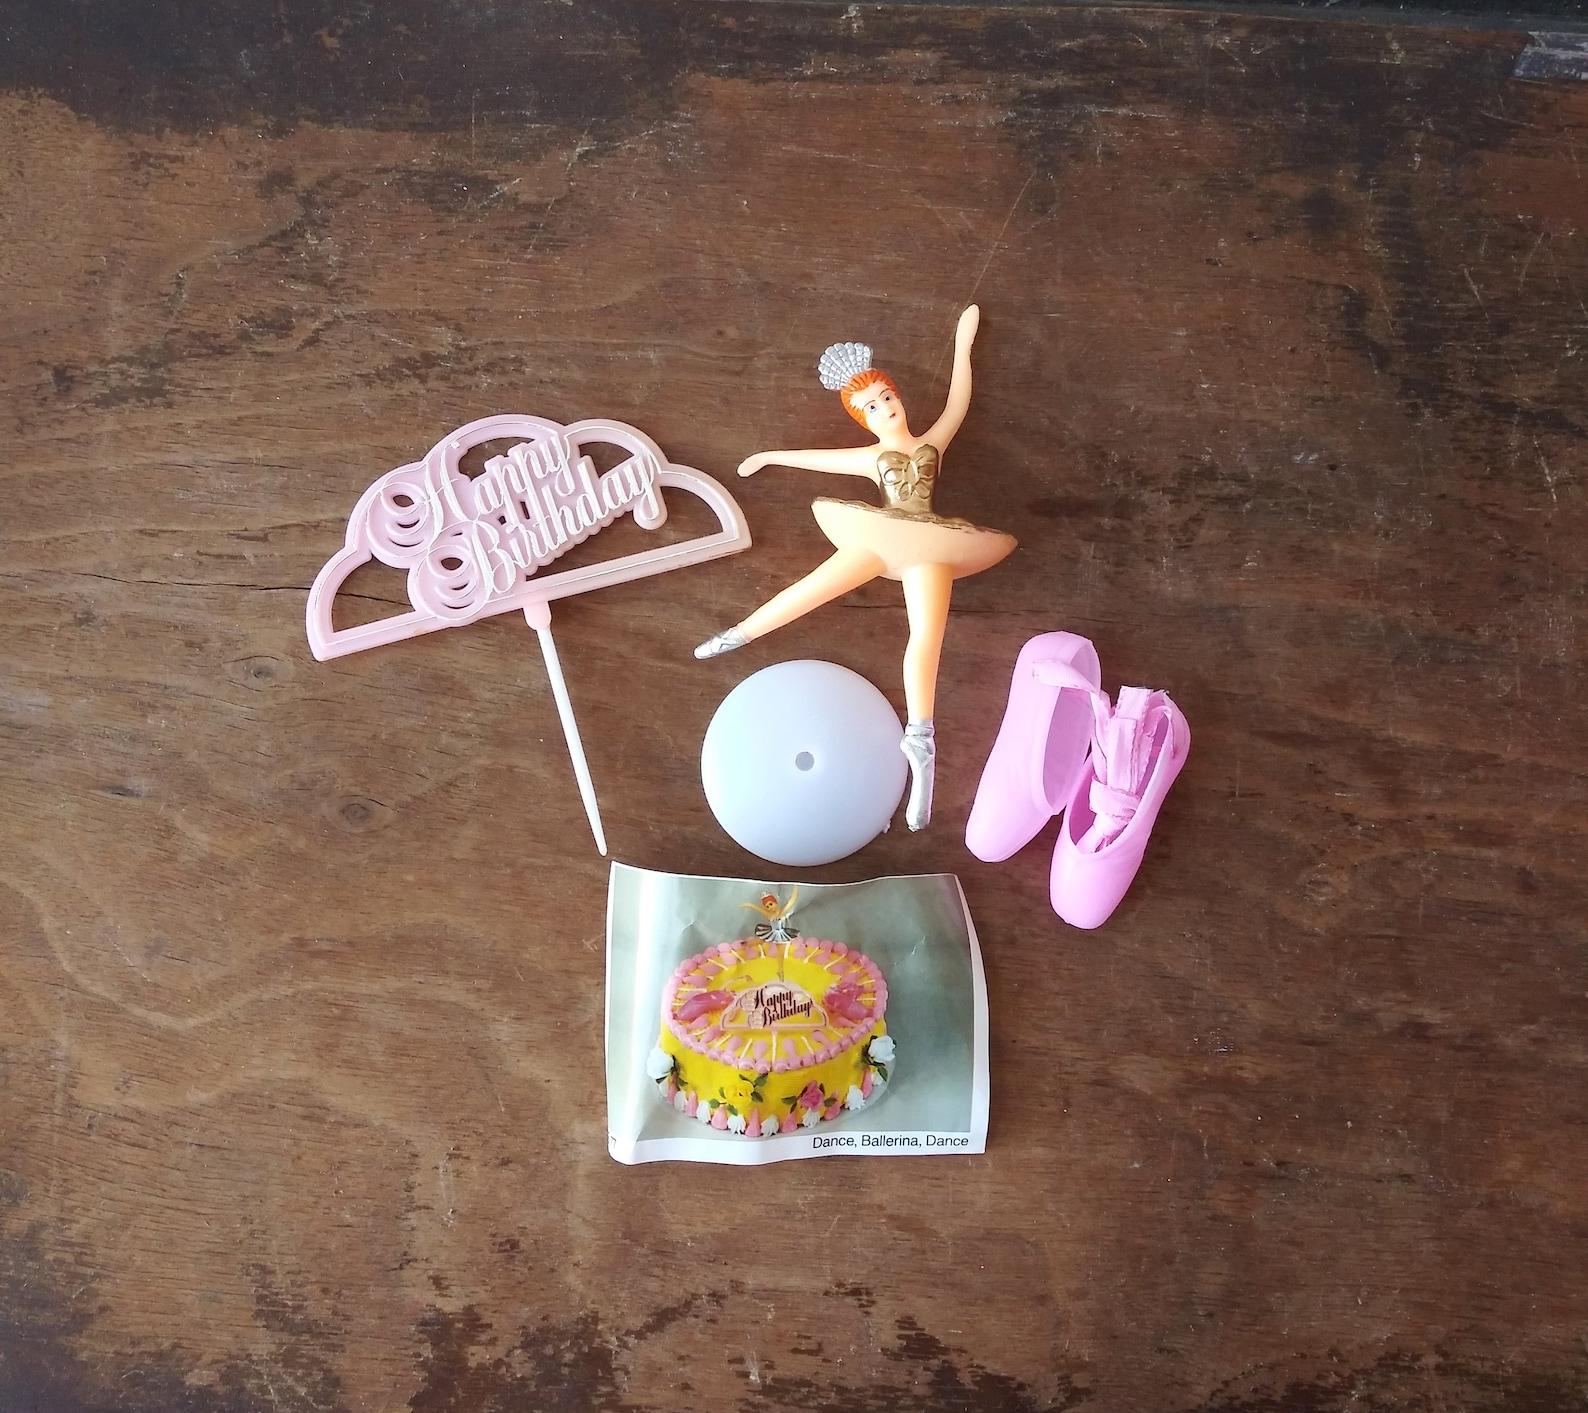 vintage birthday cake decorations ballerina pink ballet shoes happy birthday 70's 80's cake decorating supplies